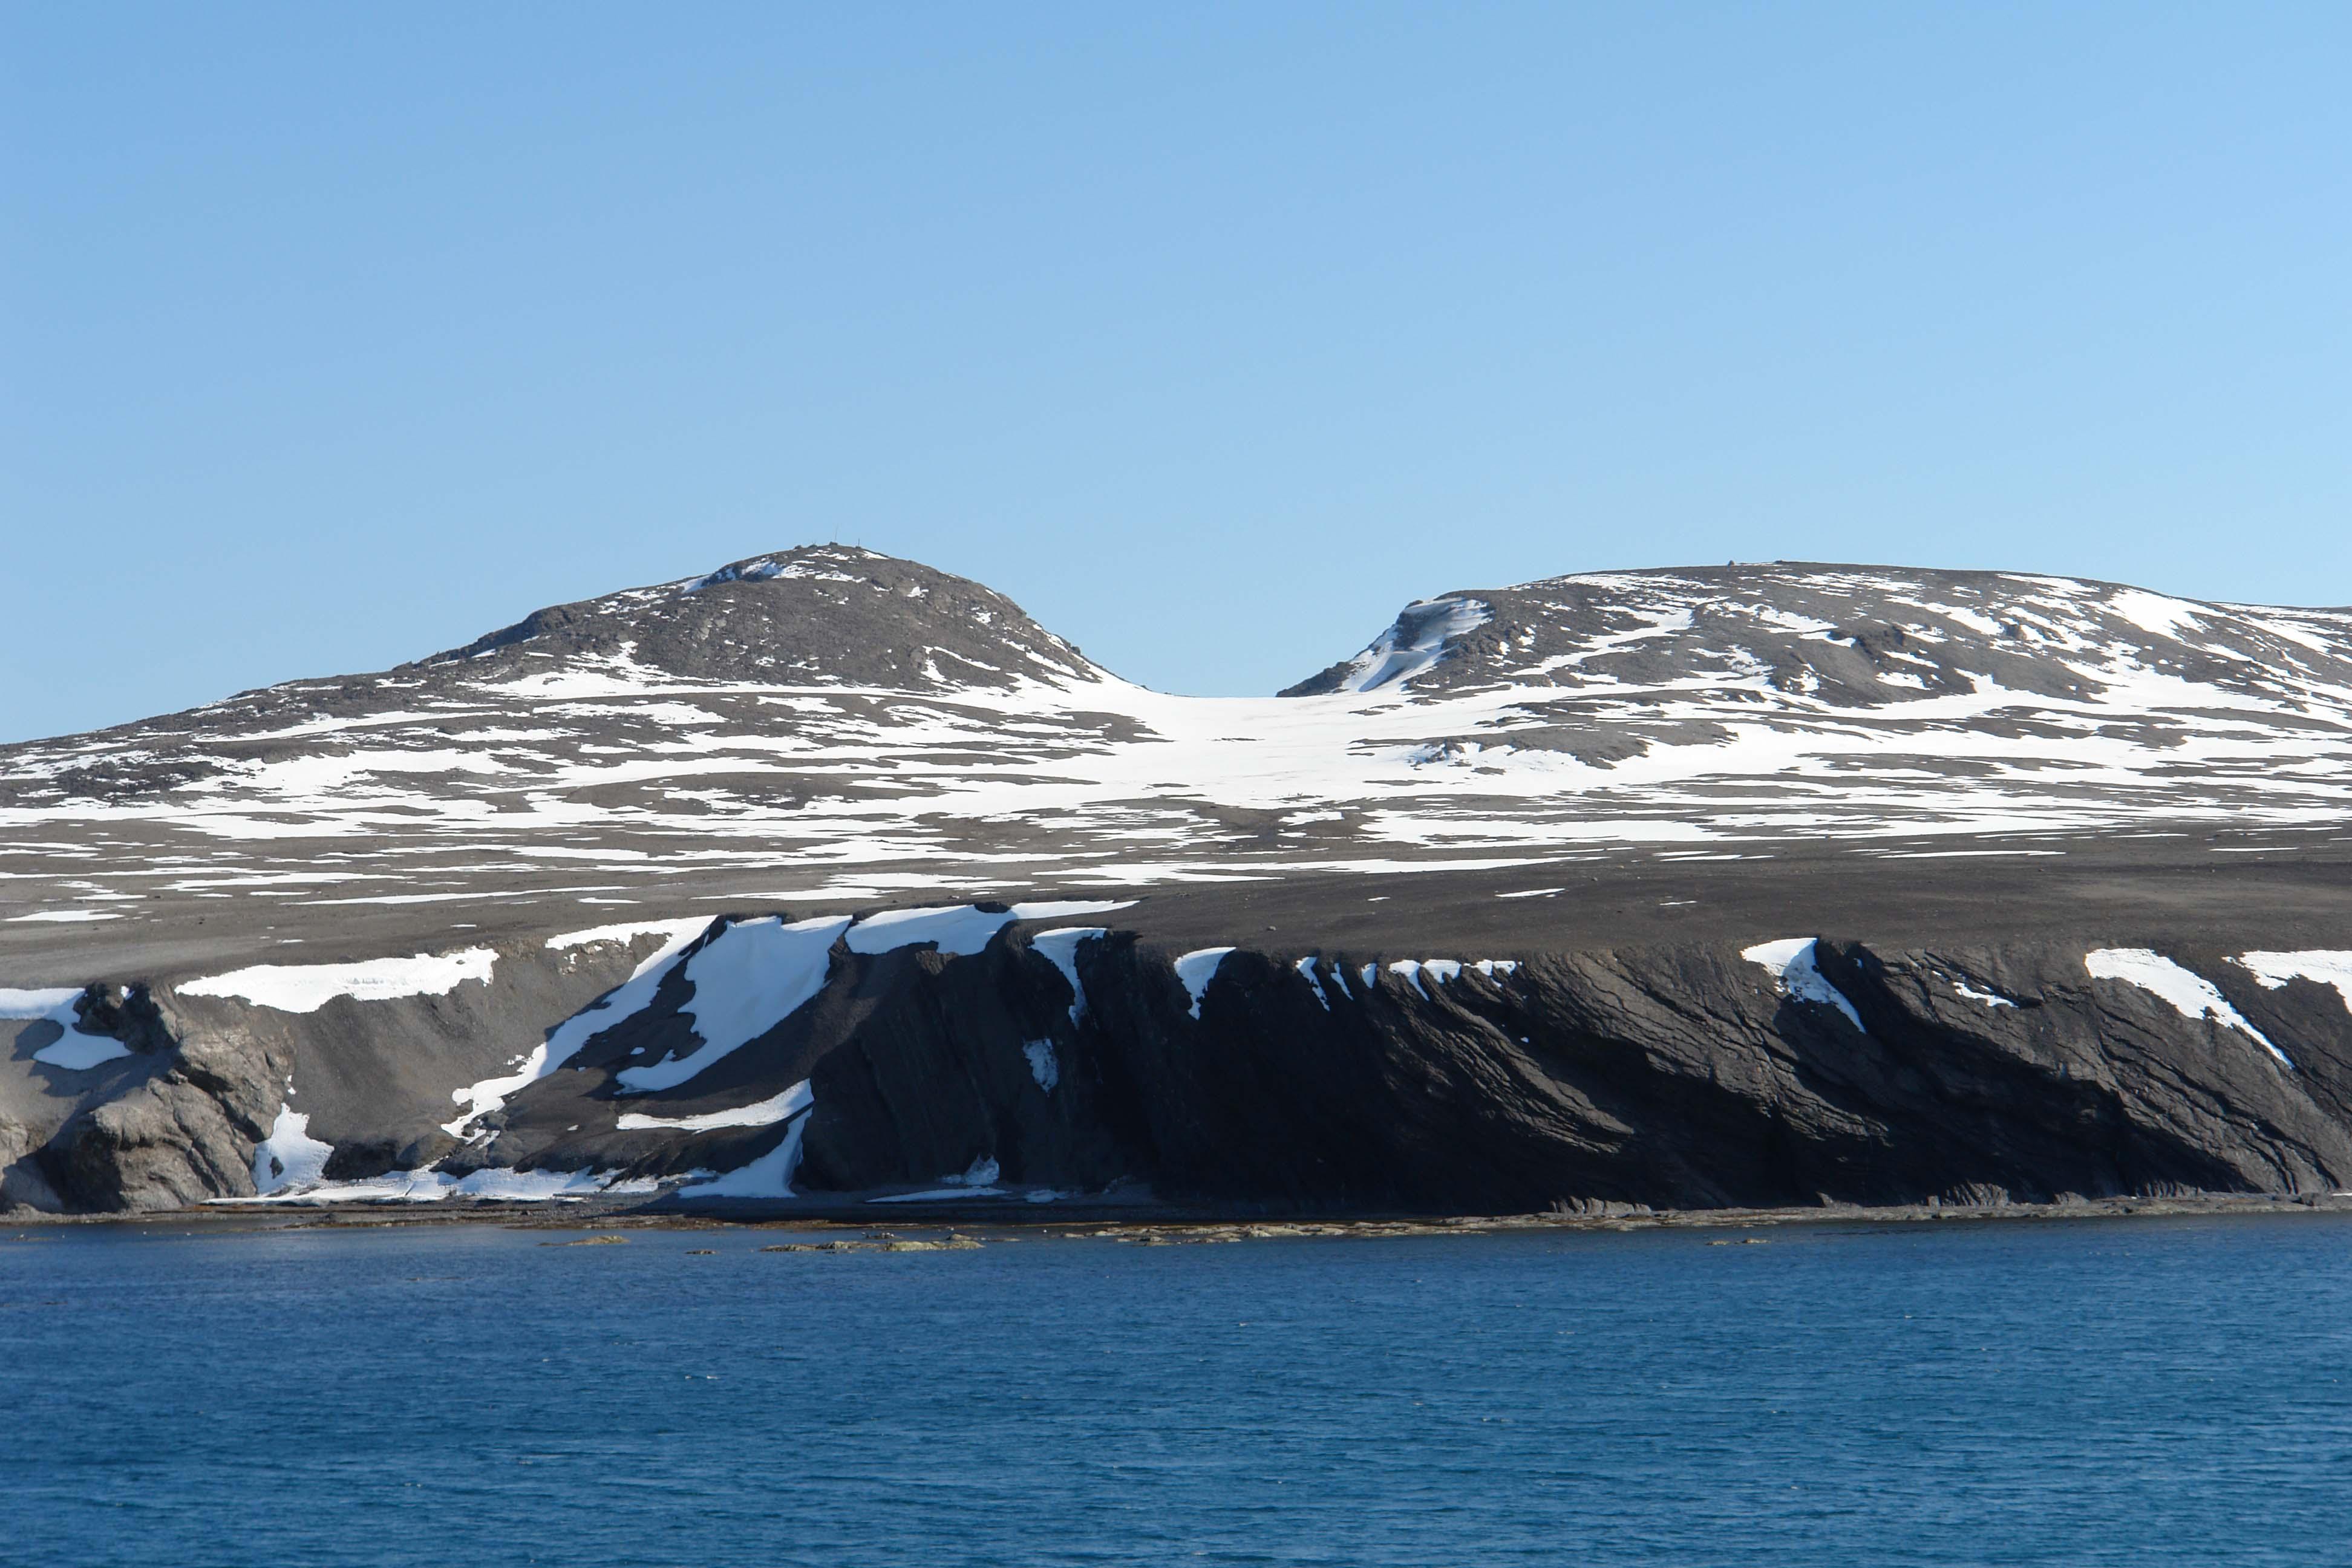 архипелаг Земля Франца-Иосифа